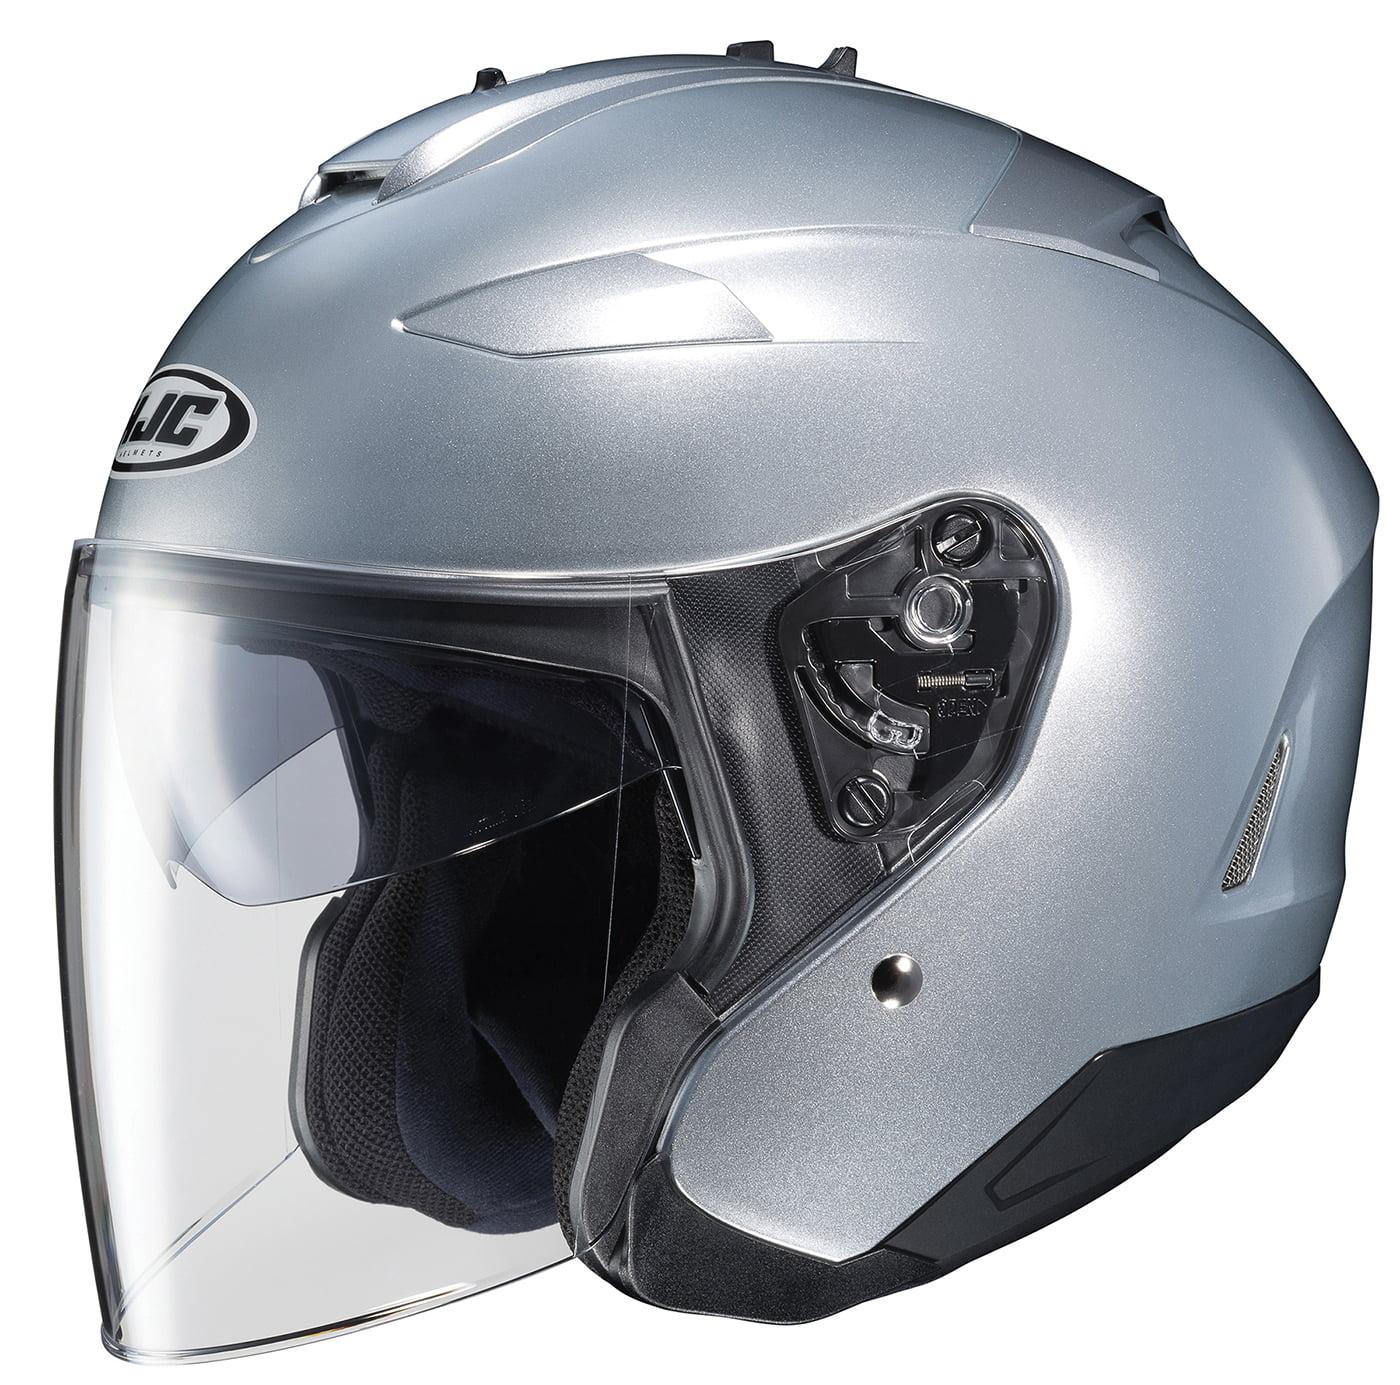 HJC IS-33 II Solid Helmet (Silver, Large)